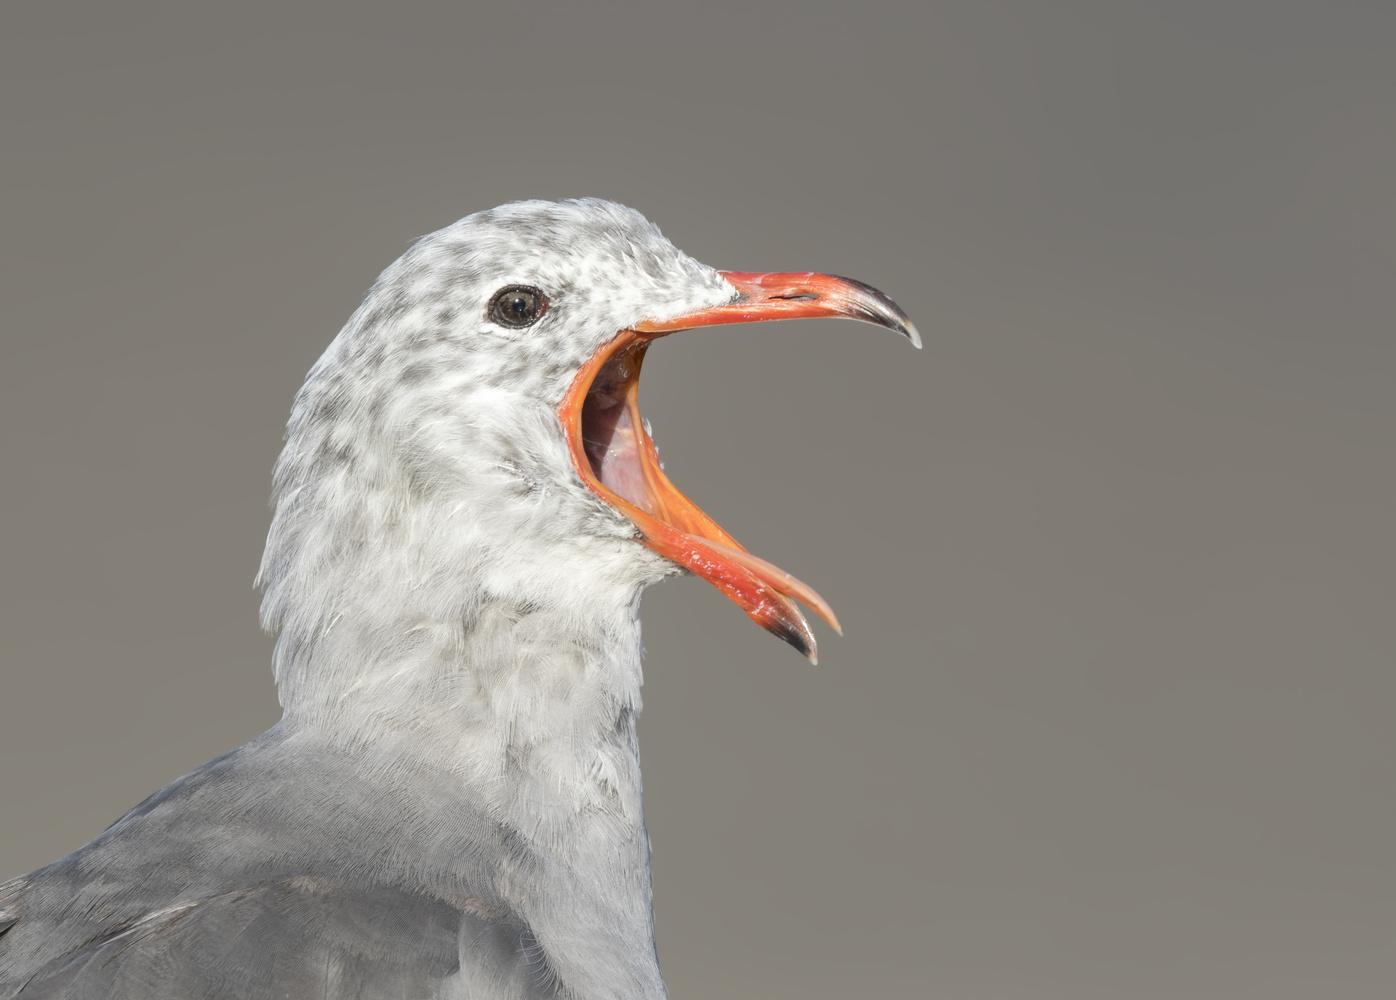 Heerman's Gull by Nickolas Thurston